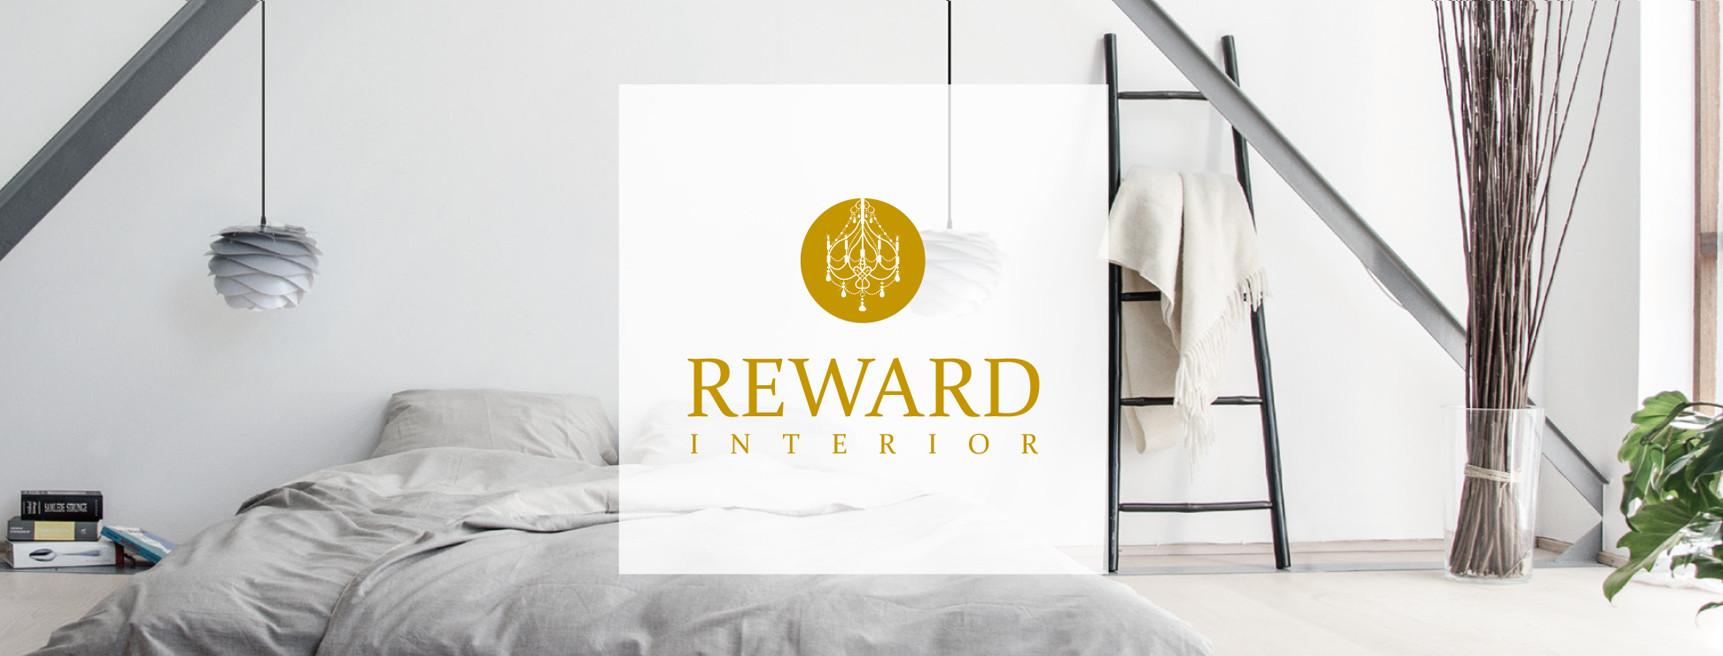 REWARD INTERIOR